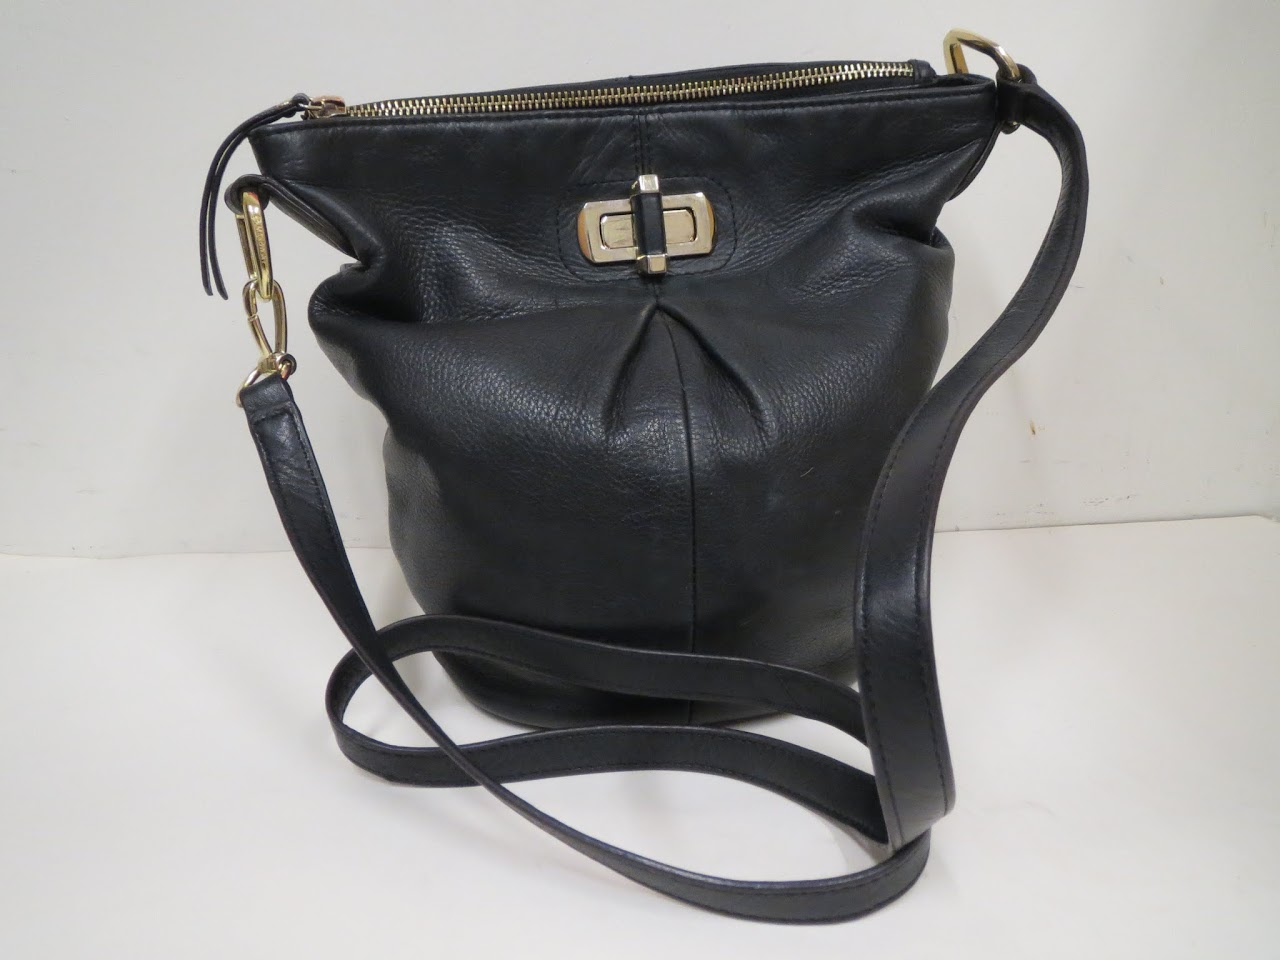 B Makowsky Bucket Bag